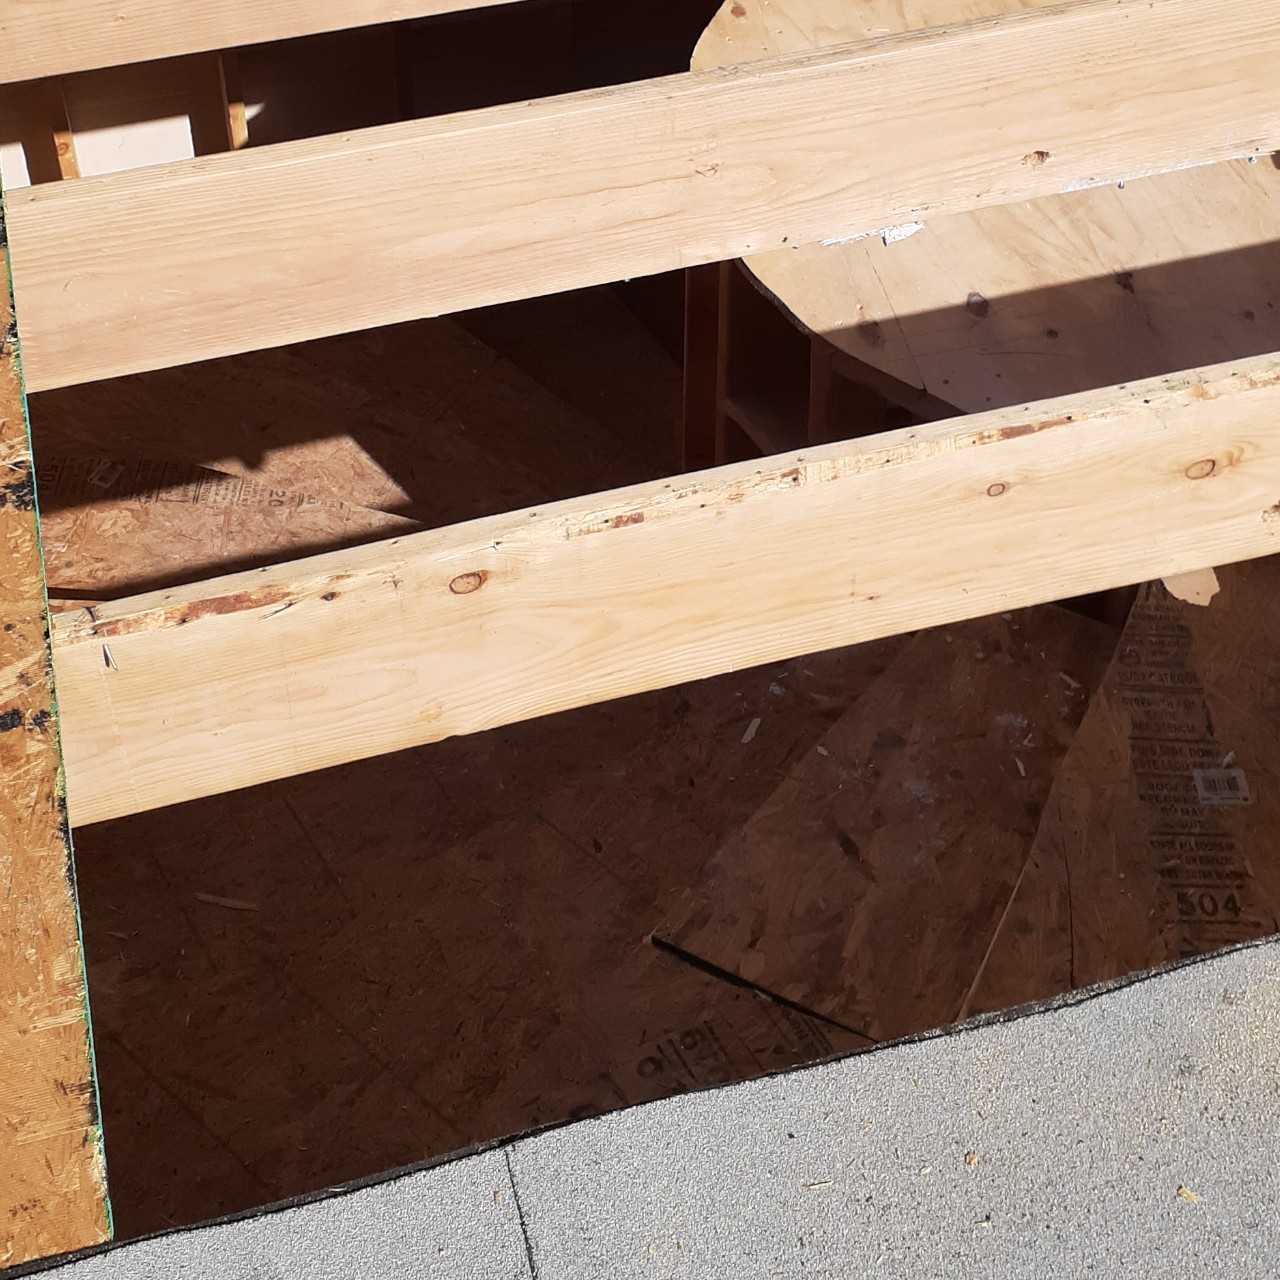 carpentry-wood-framing-second-floor-home-addition--framing-53